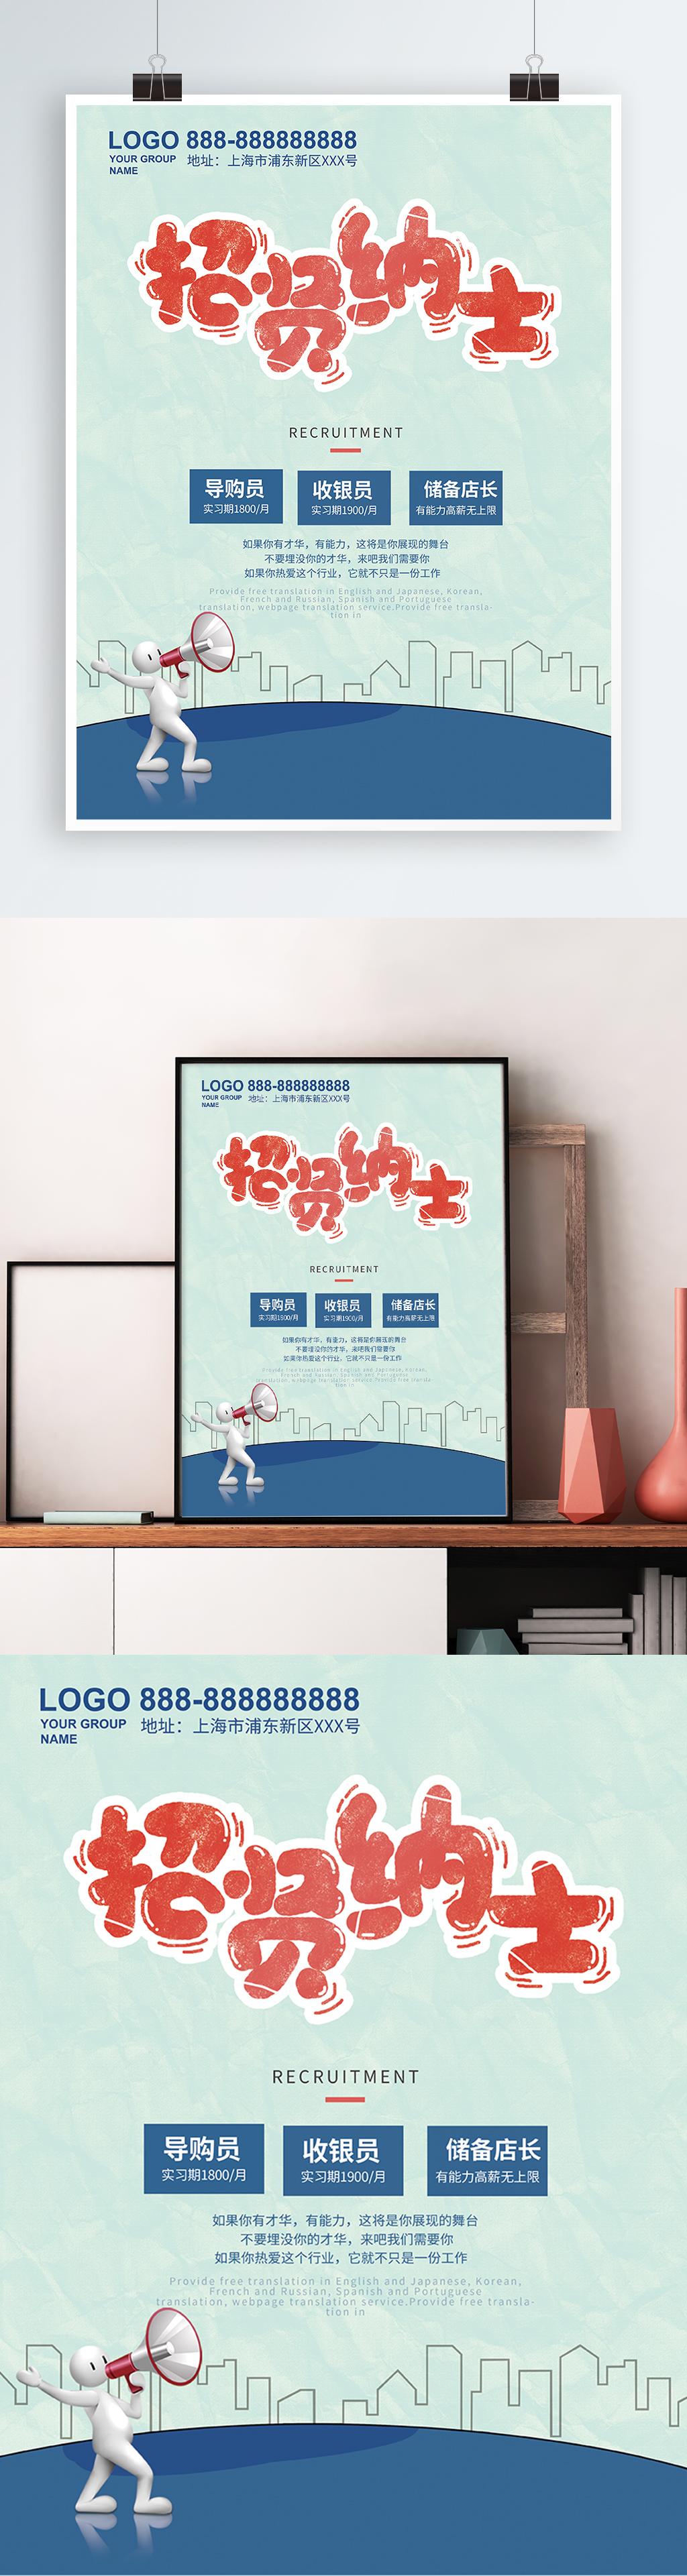 Recruitment gradient corporate minimalist creative text